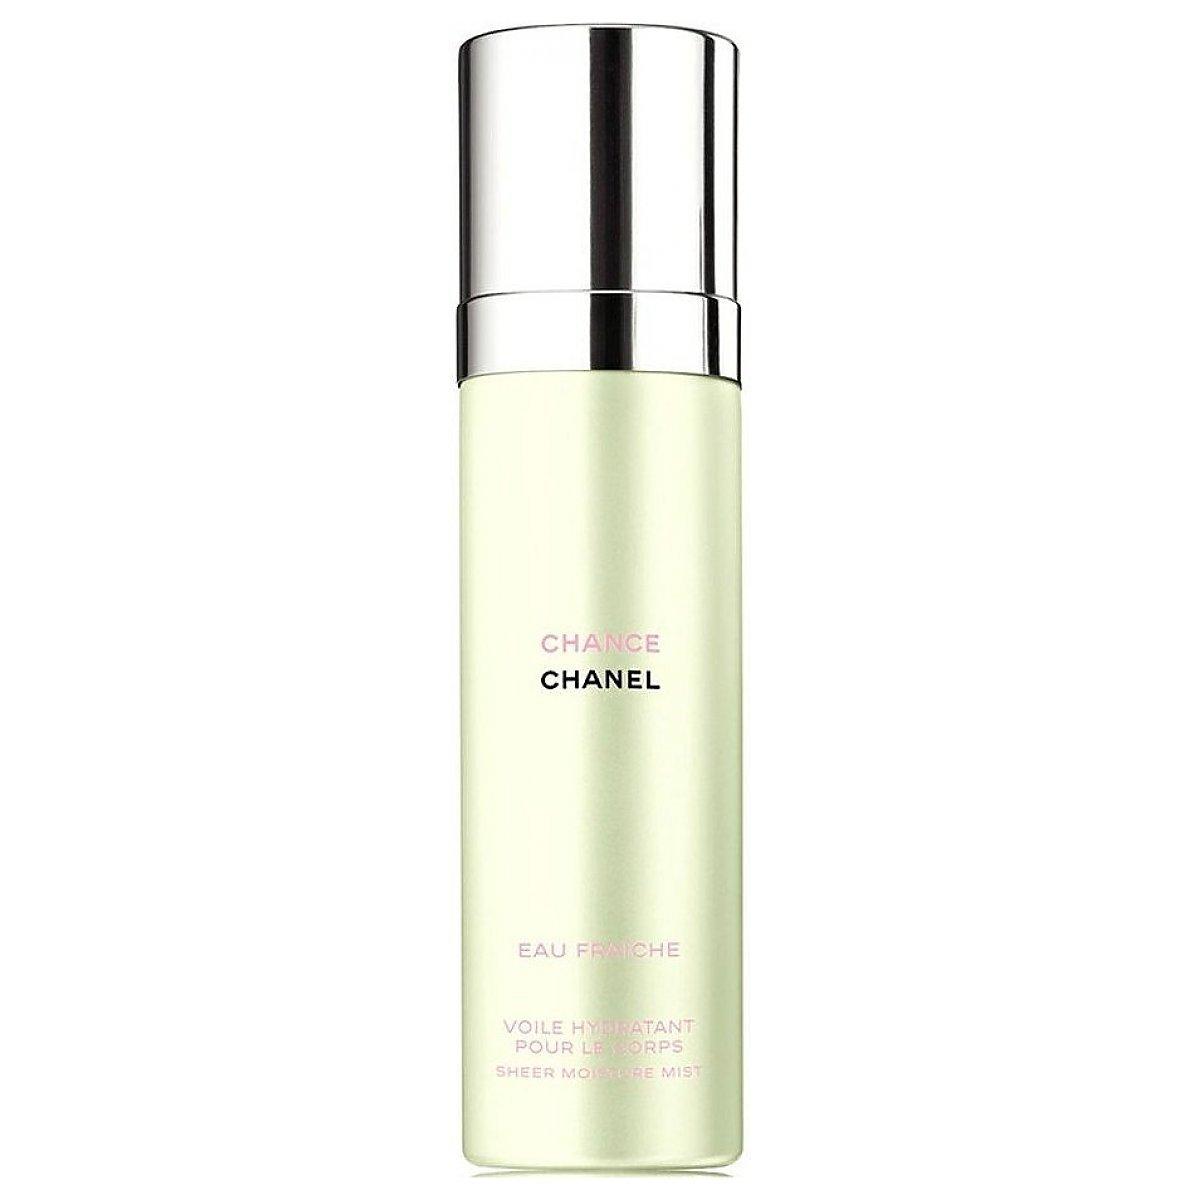 Chanel chance eau fraiche mgielka do ciala 100ml for Chance eau fraîche